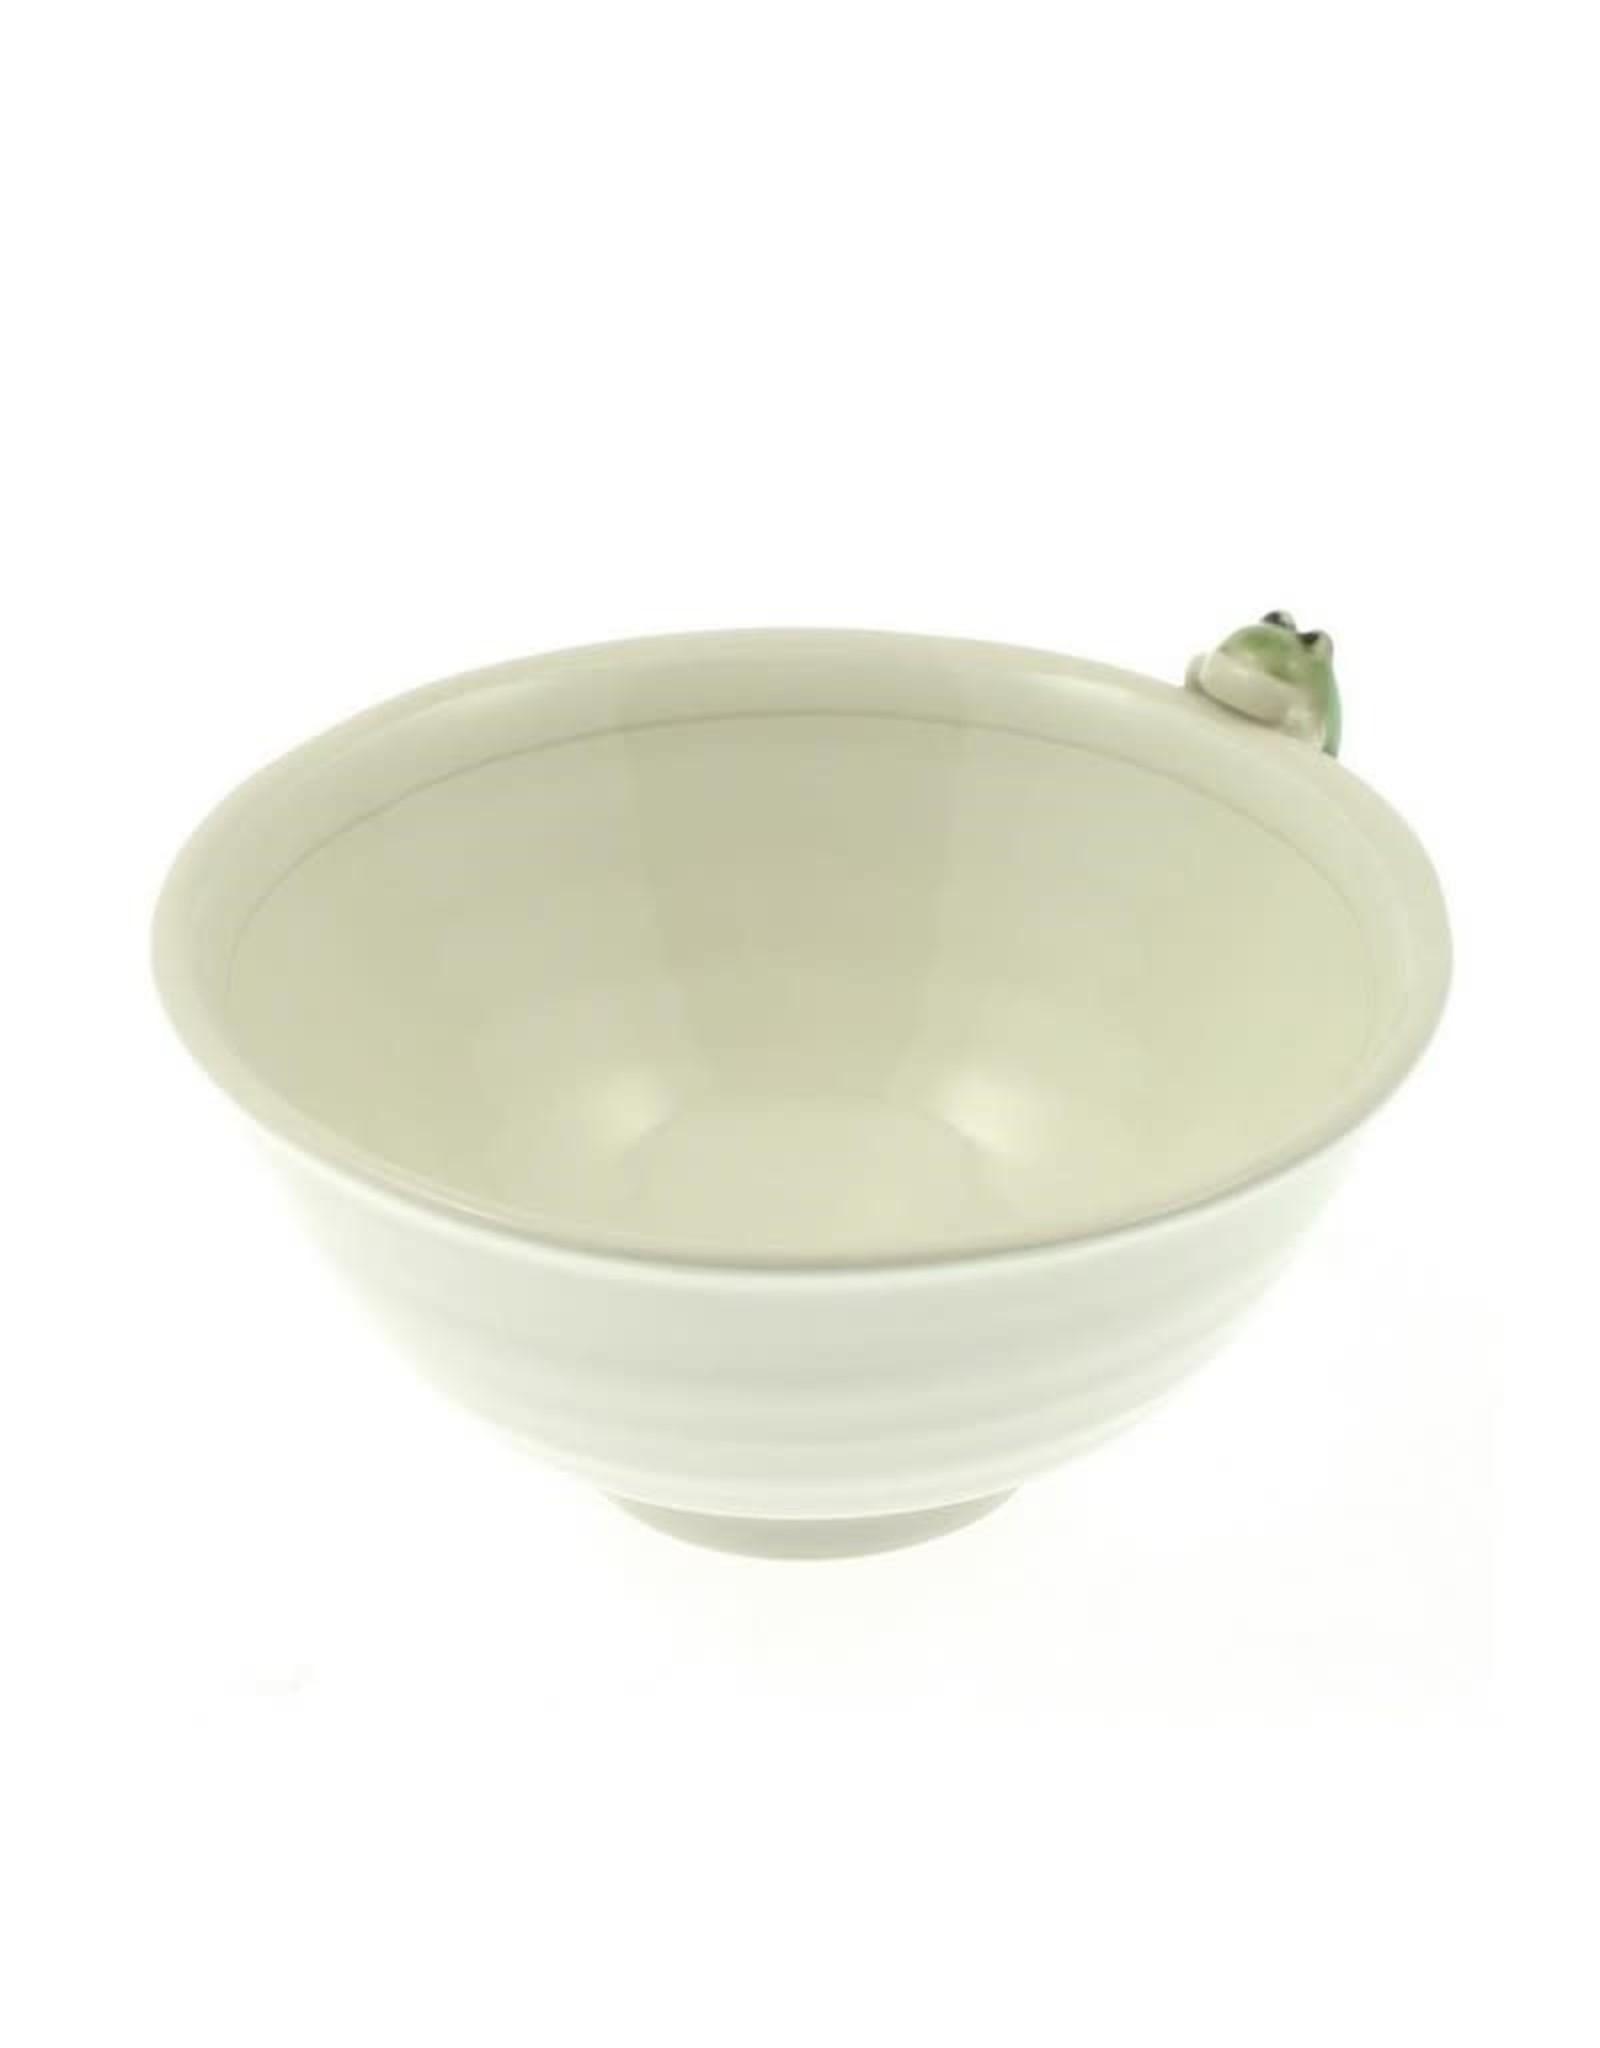 Kotobuki Trading Co. Inc Rice Bowl Frog/Dragonfly